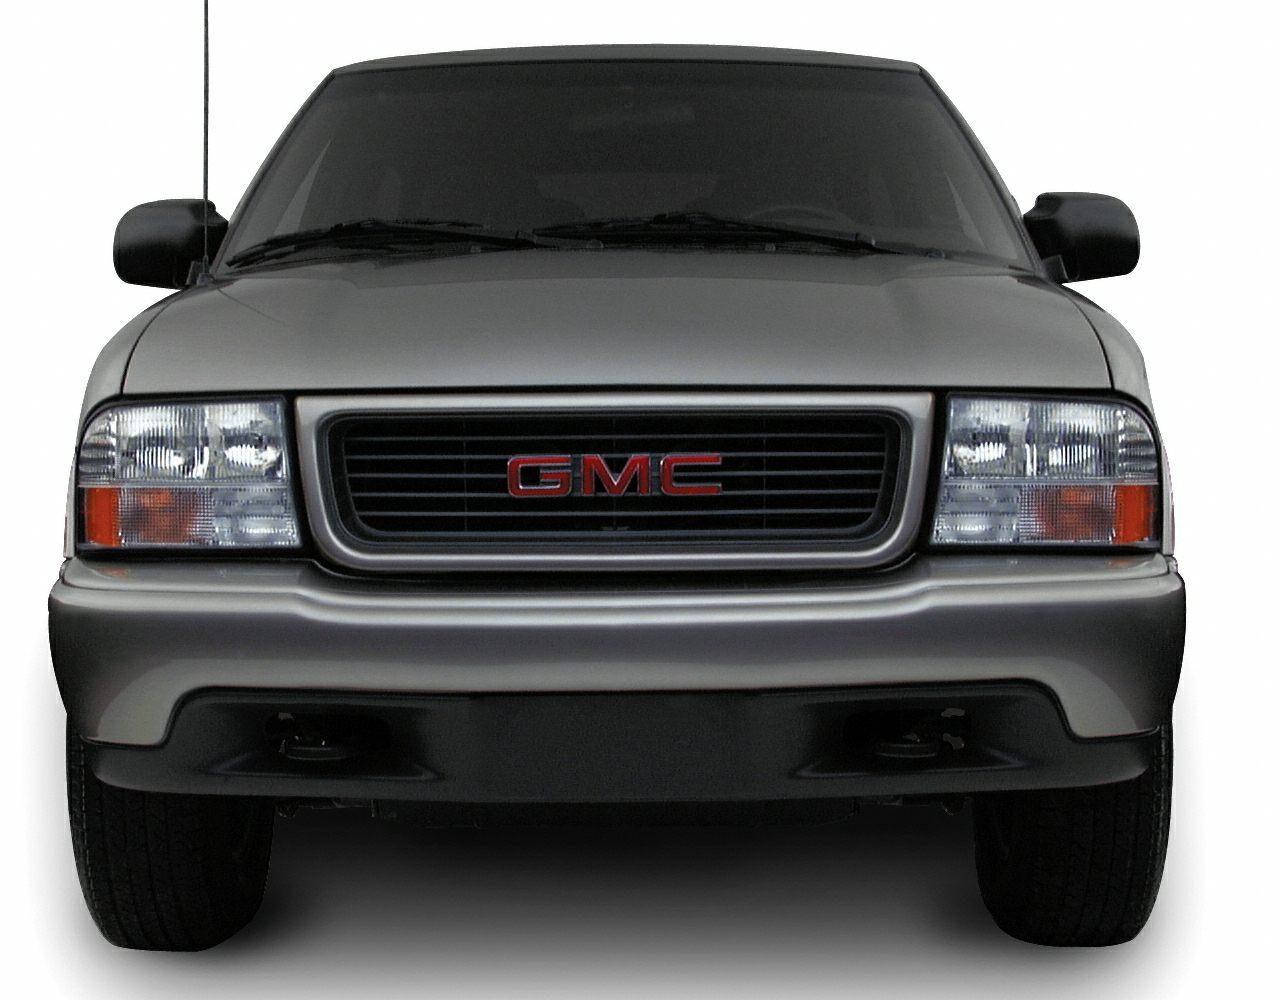 Cab Gms B on 2000 Gmc Jimmy Sls Engine